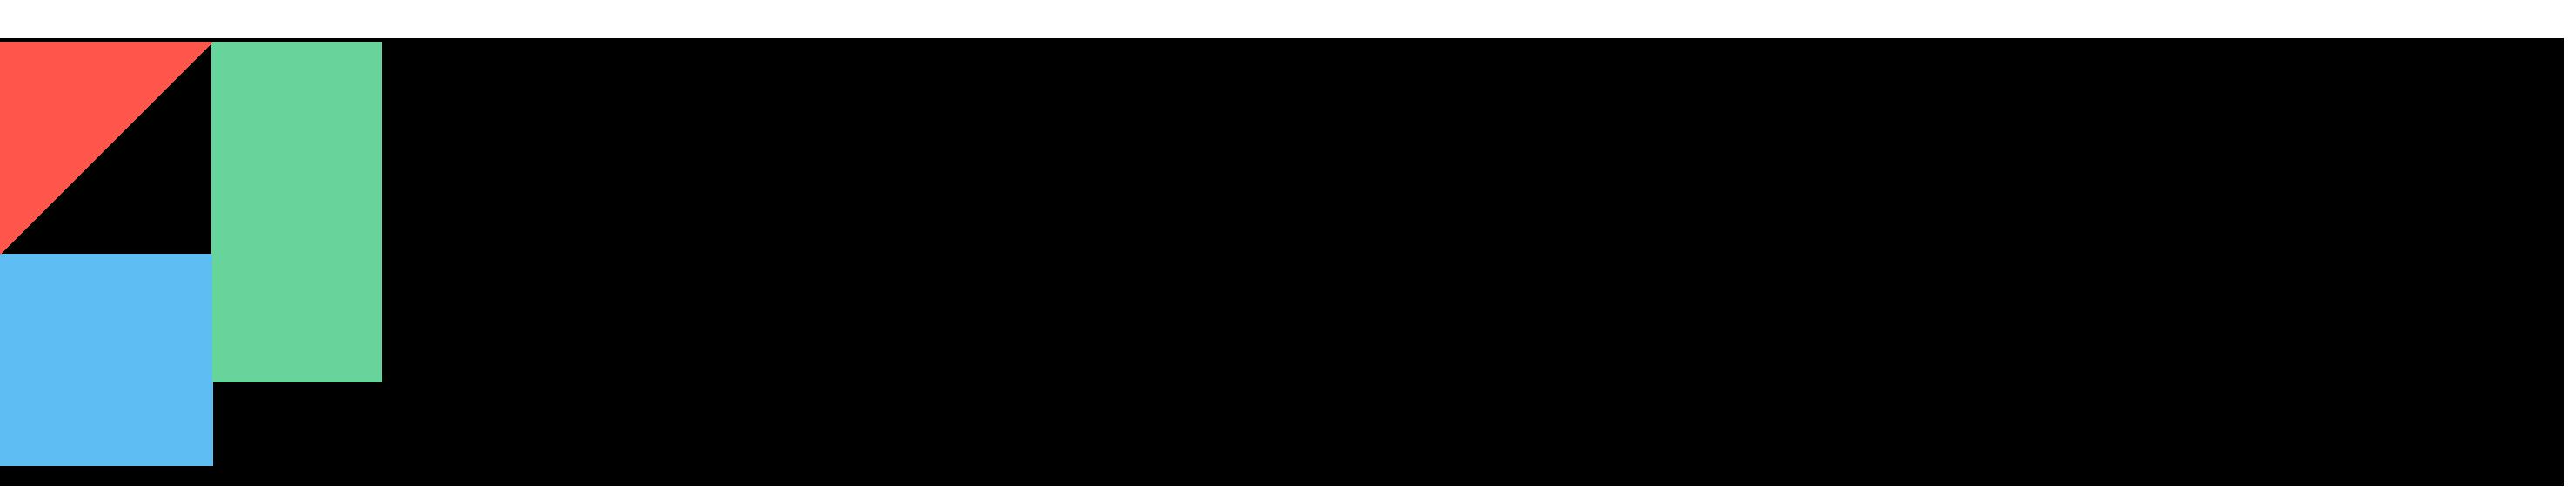 Process Pulse by Camo Analytics